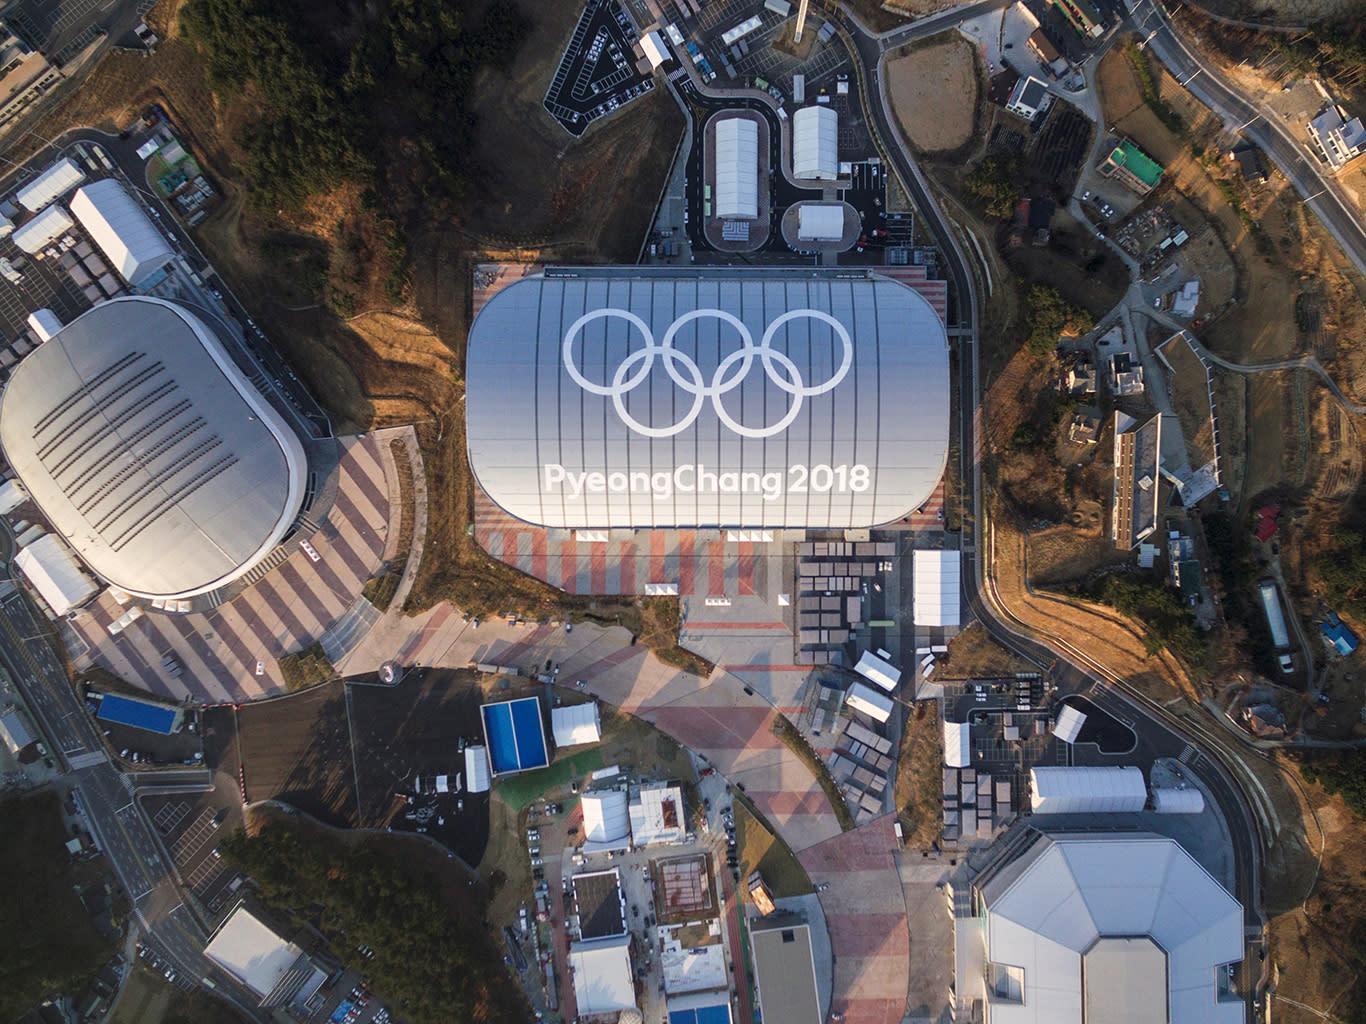 Olympics hook up site